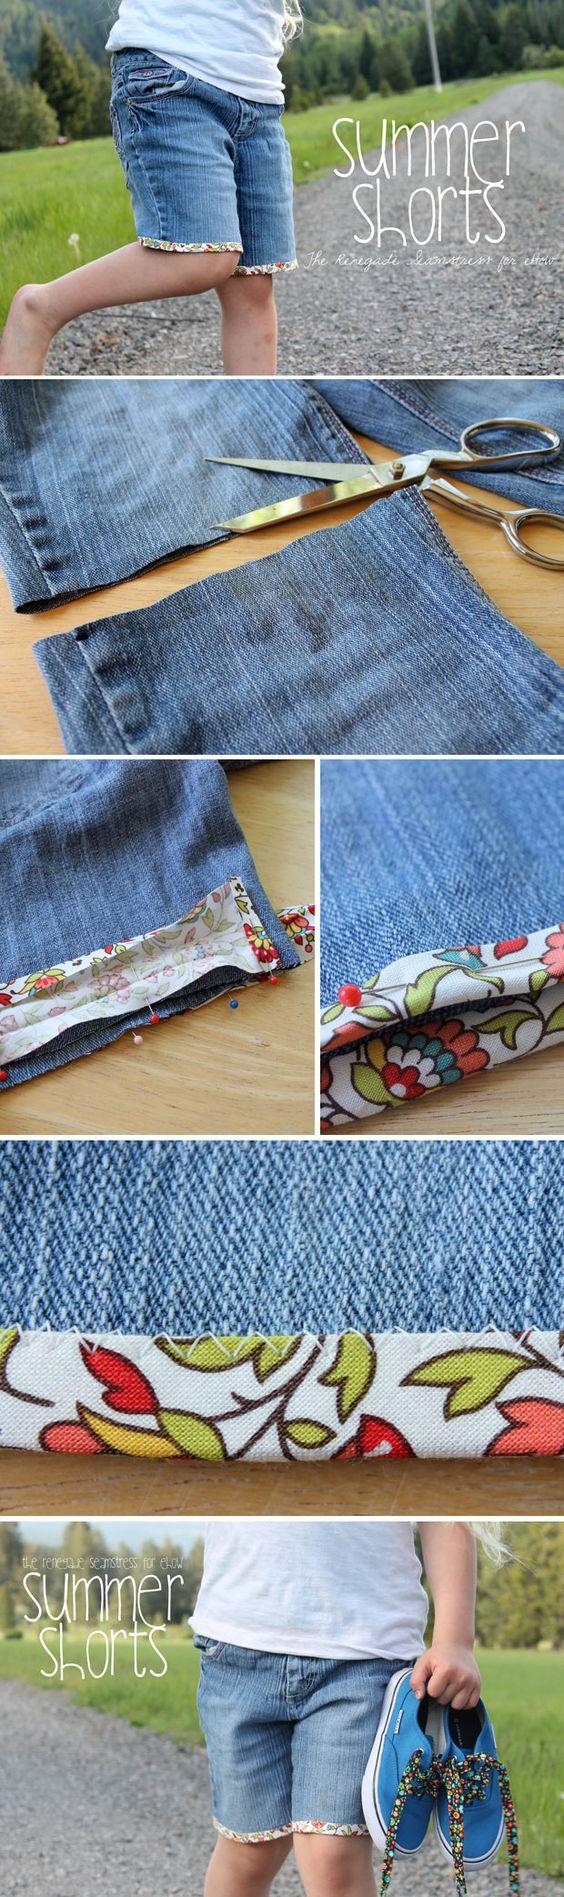 tutorial transformar jeans em shorts